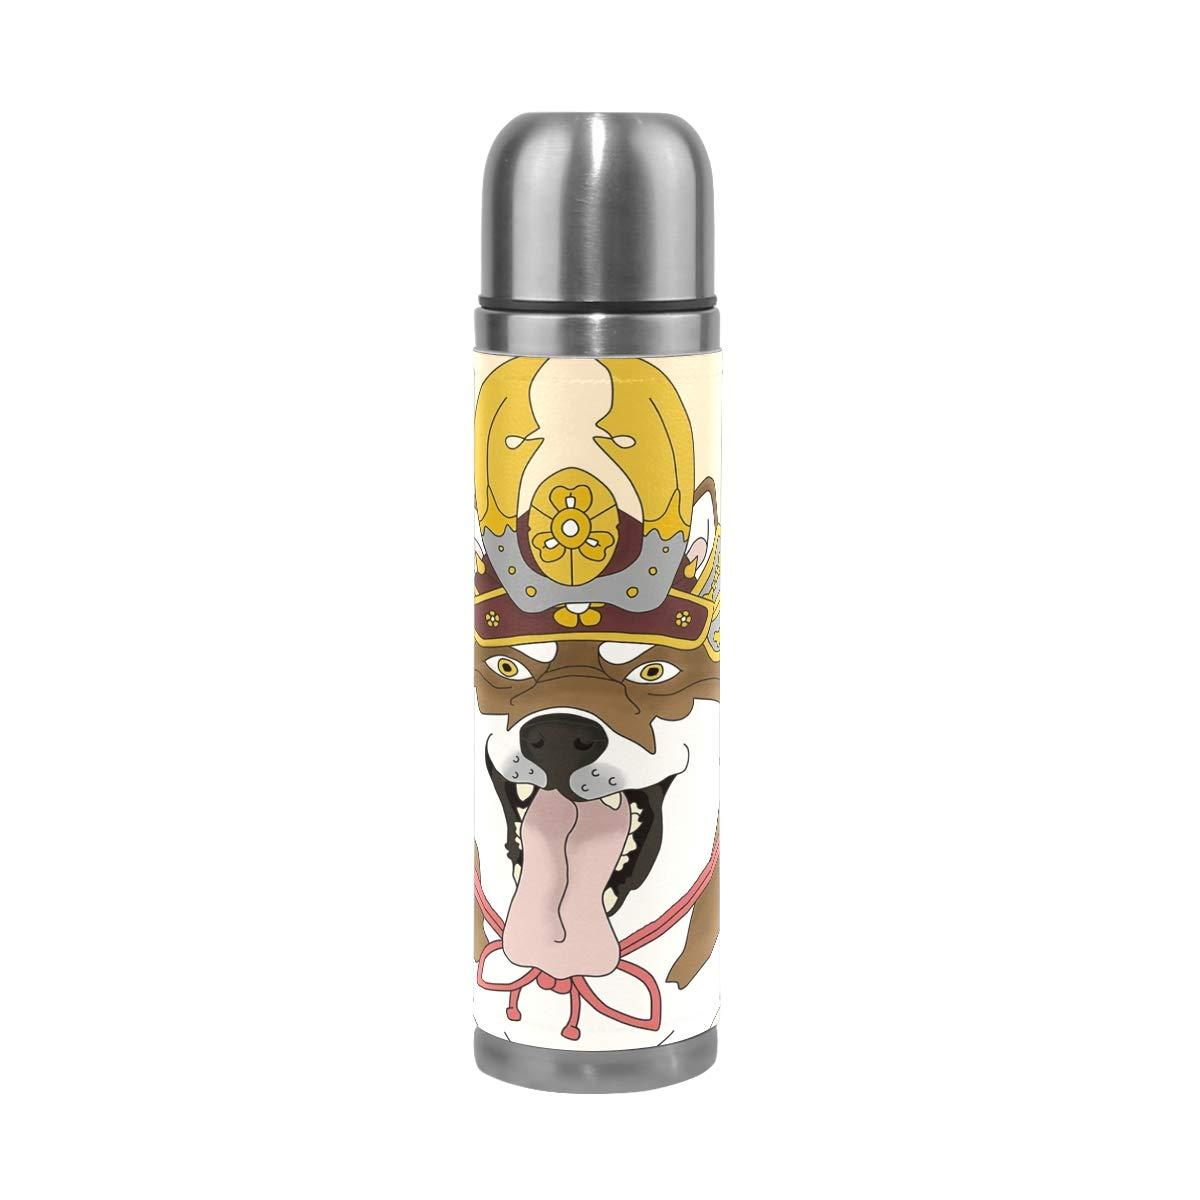 061ba0c818 Amazon.com : HLive Stainless Steel Dinosaur Era Water Bottle Thermos ...